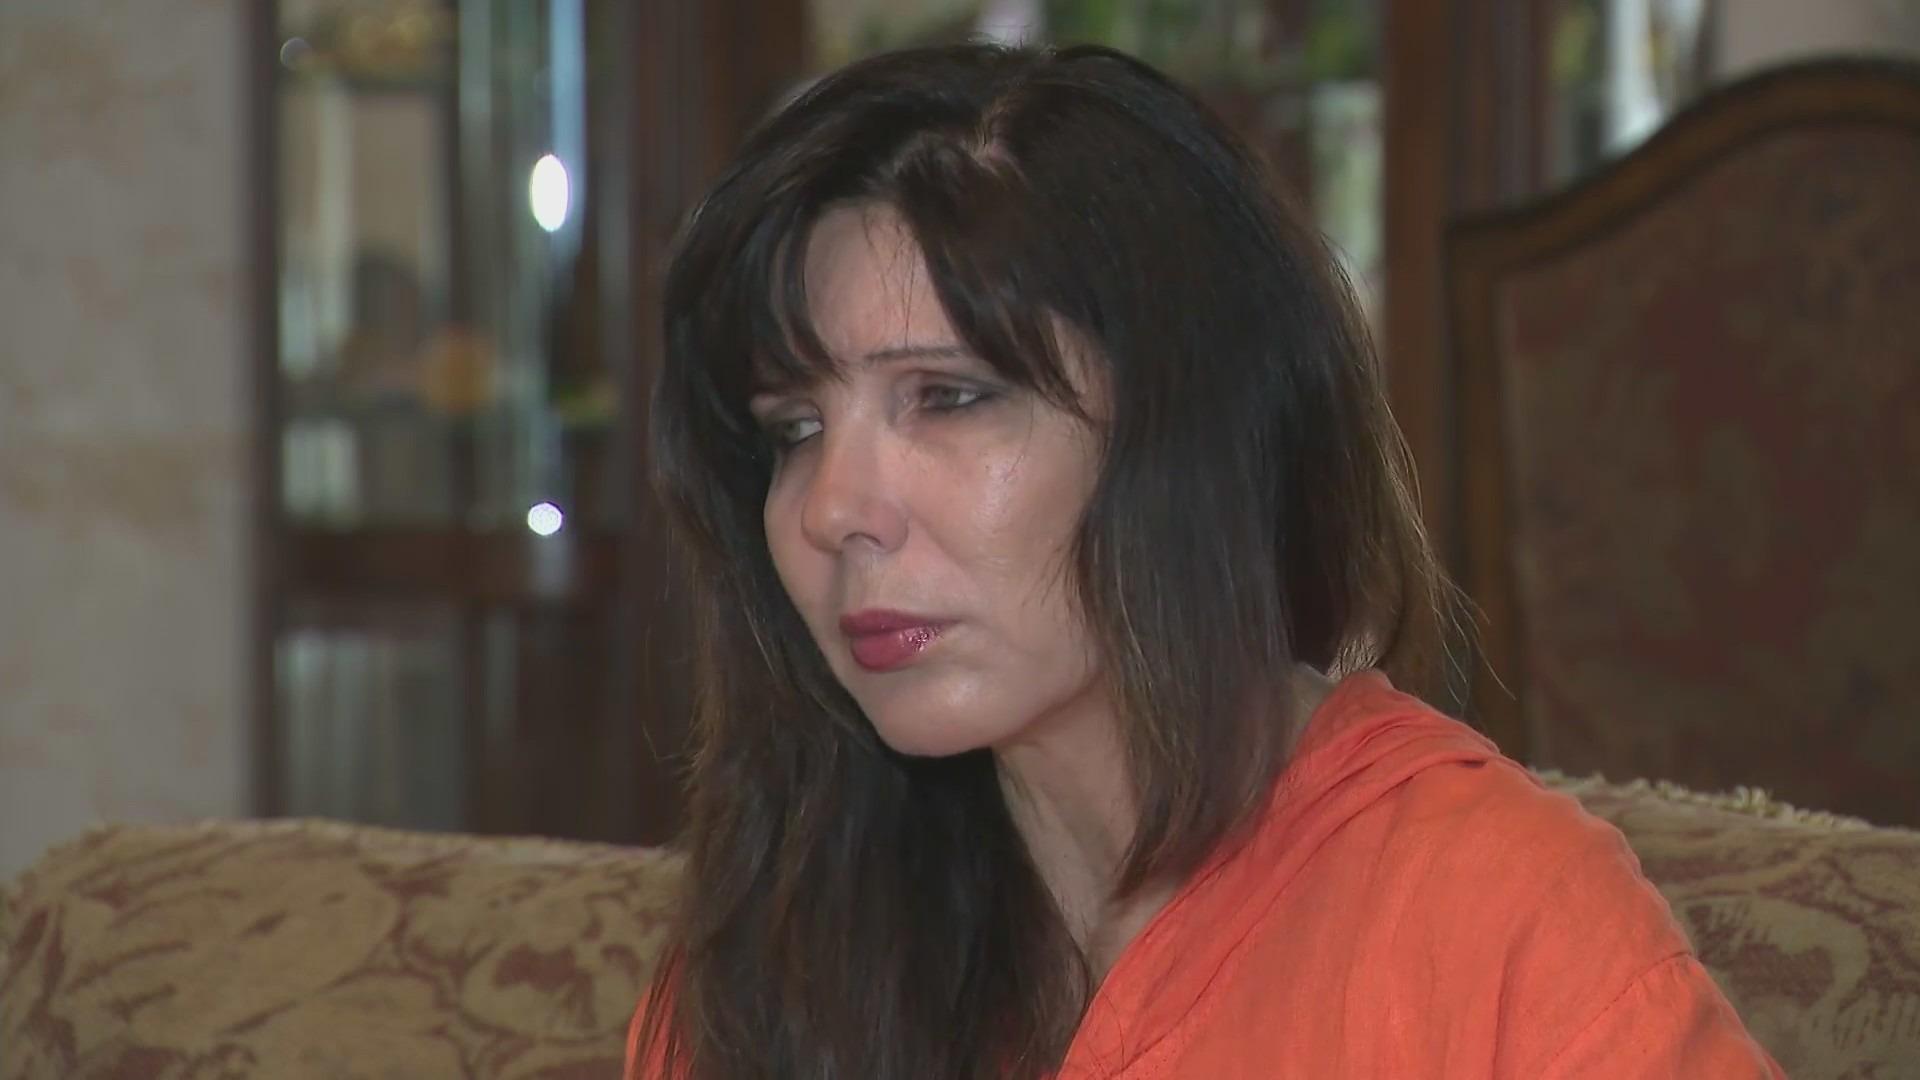 Tarzana resident Larisa Vinnitskaya is still shaken on July 28, 2021, after five masked men held her and her husband at gunpoint two days earlier. (KTLA)